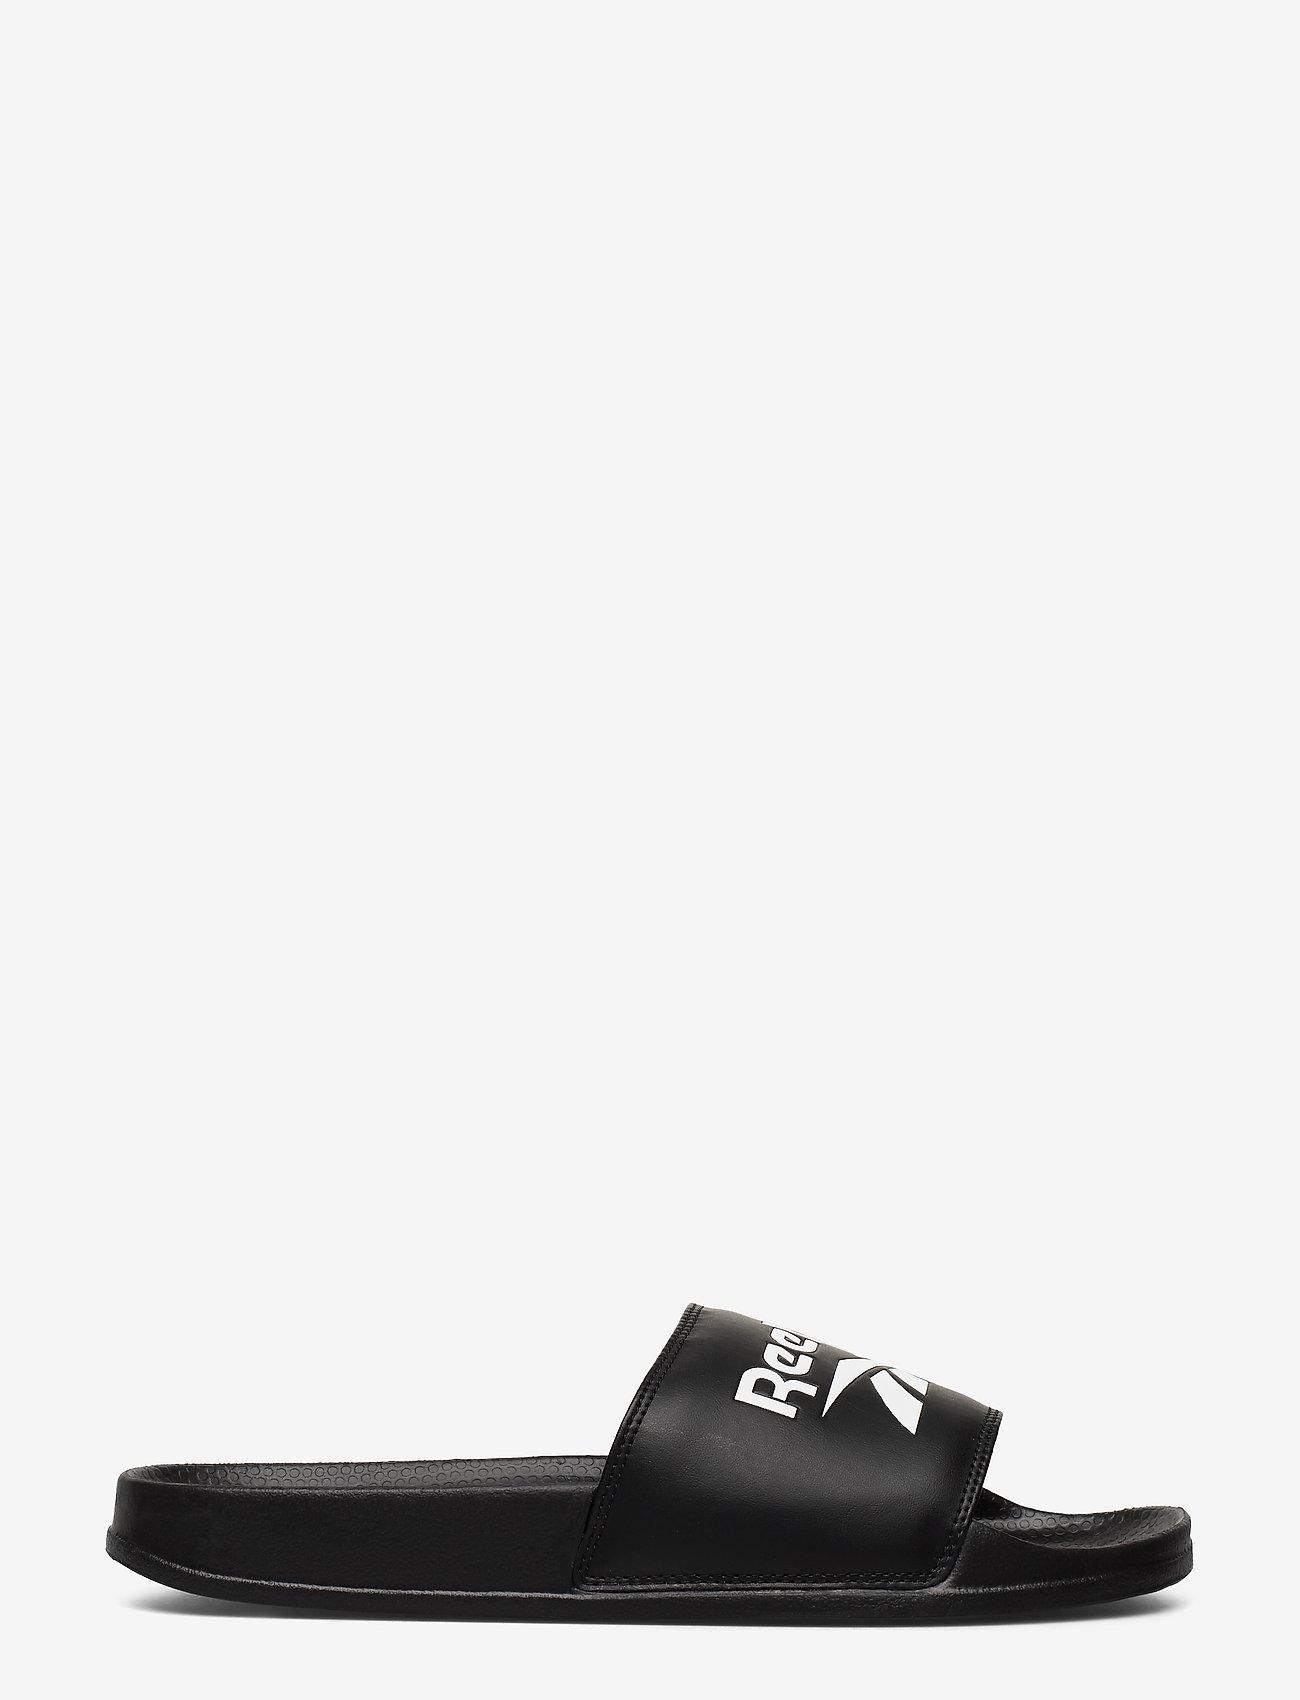 Reebok Classics - REEBOK CLASSIC SLIDE - sneakers - black/white/none - 1